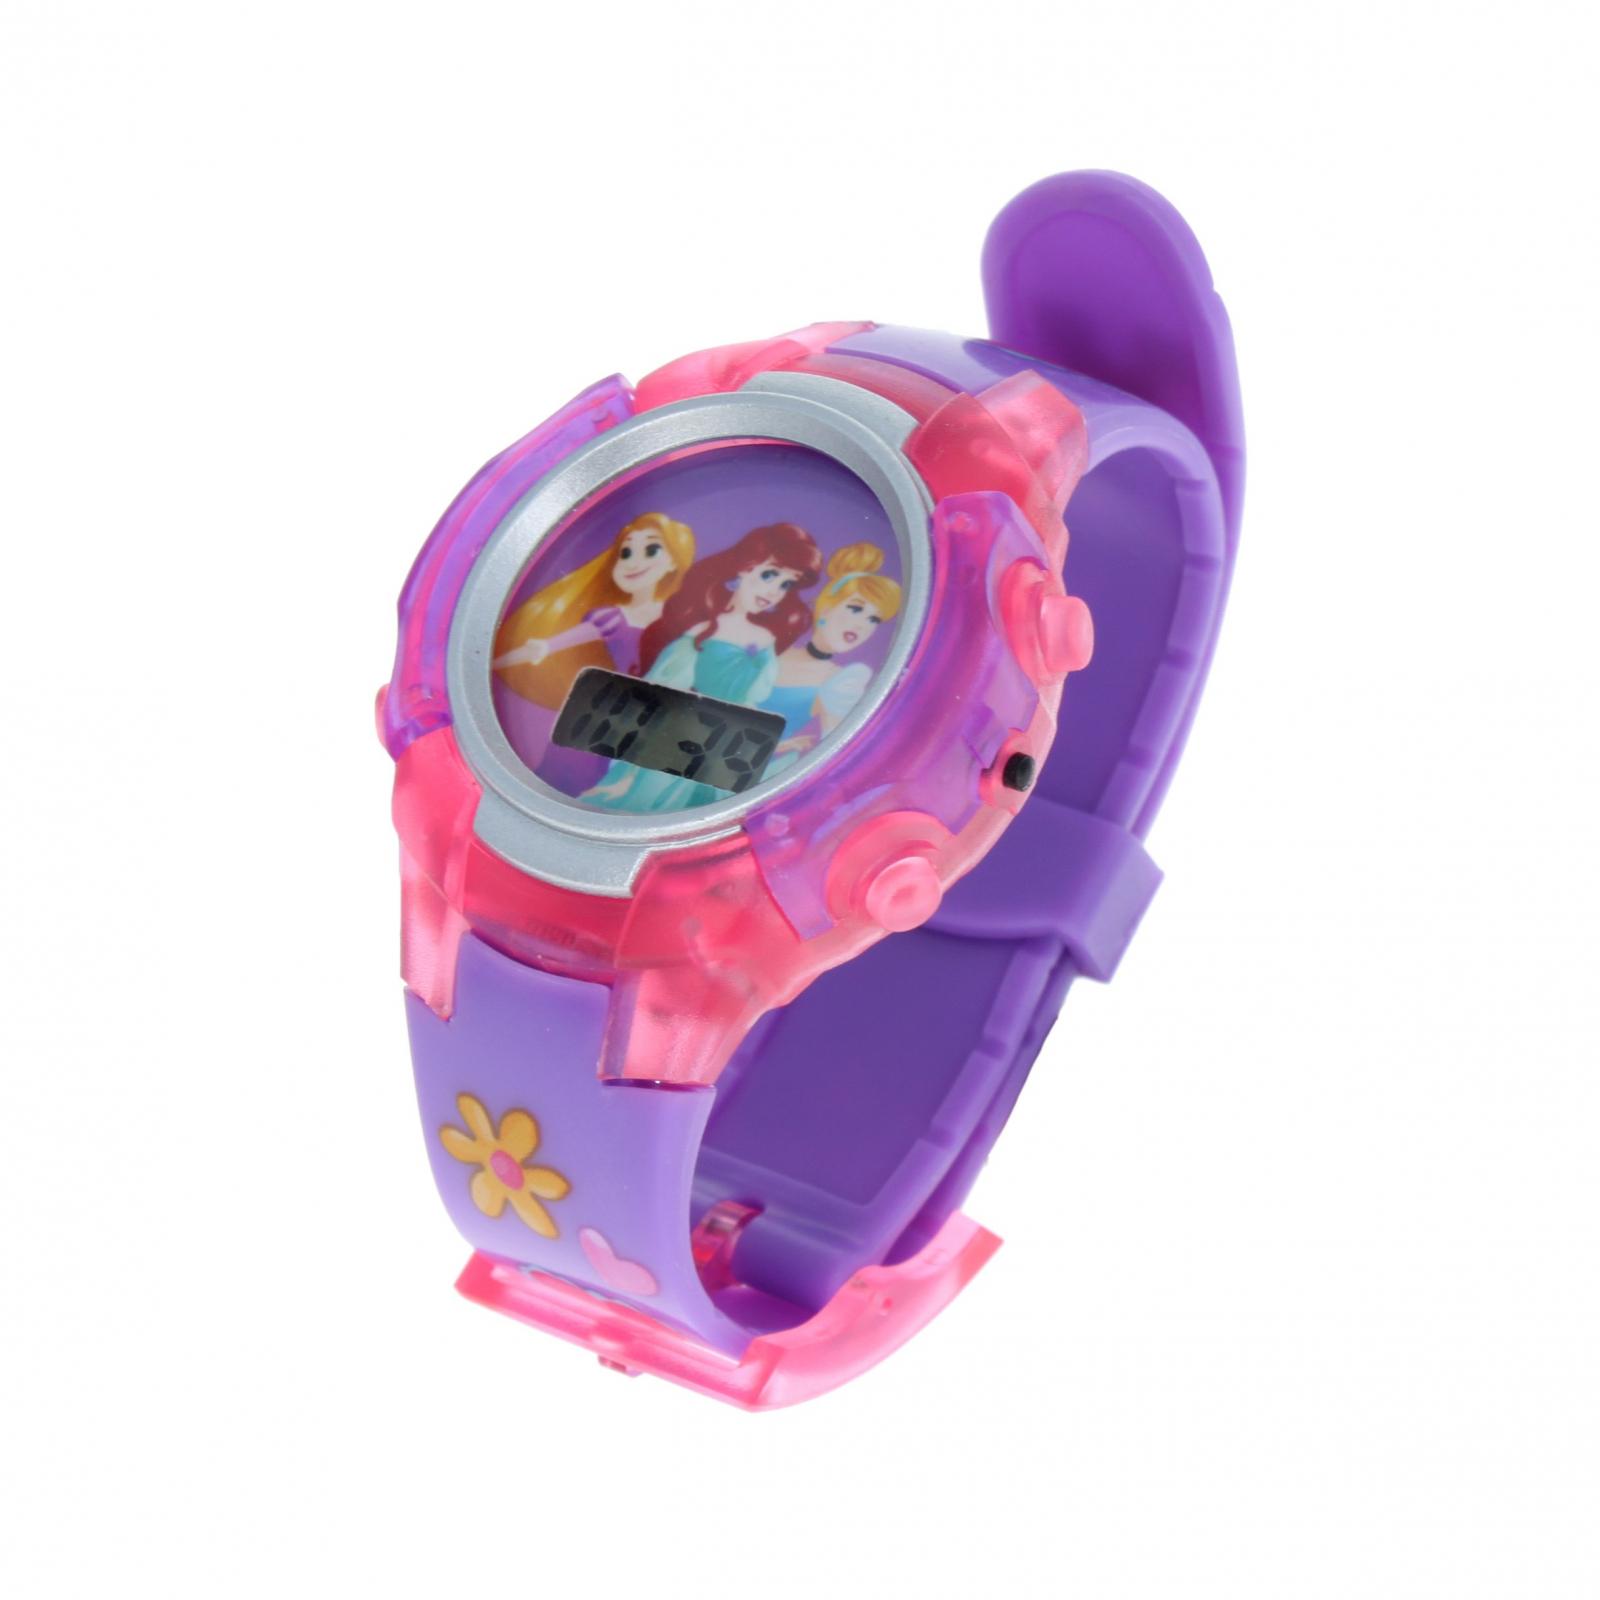 Disney Princess Adjustable Light Up Flashing LCD Wrist Watch